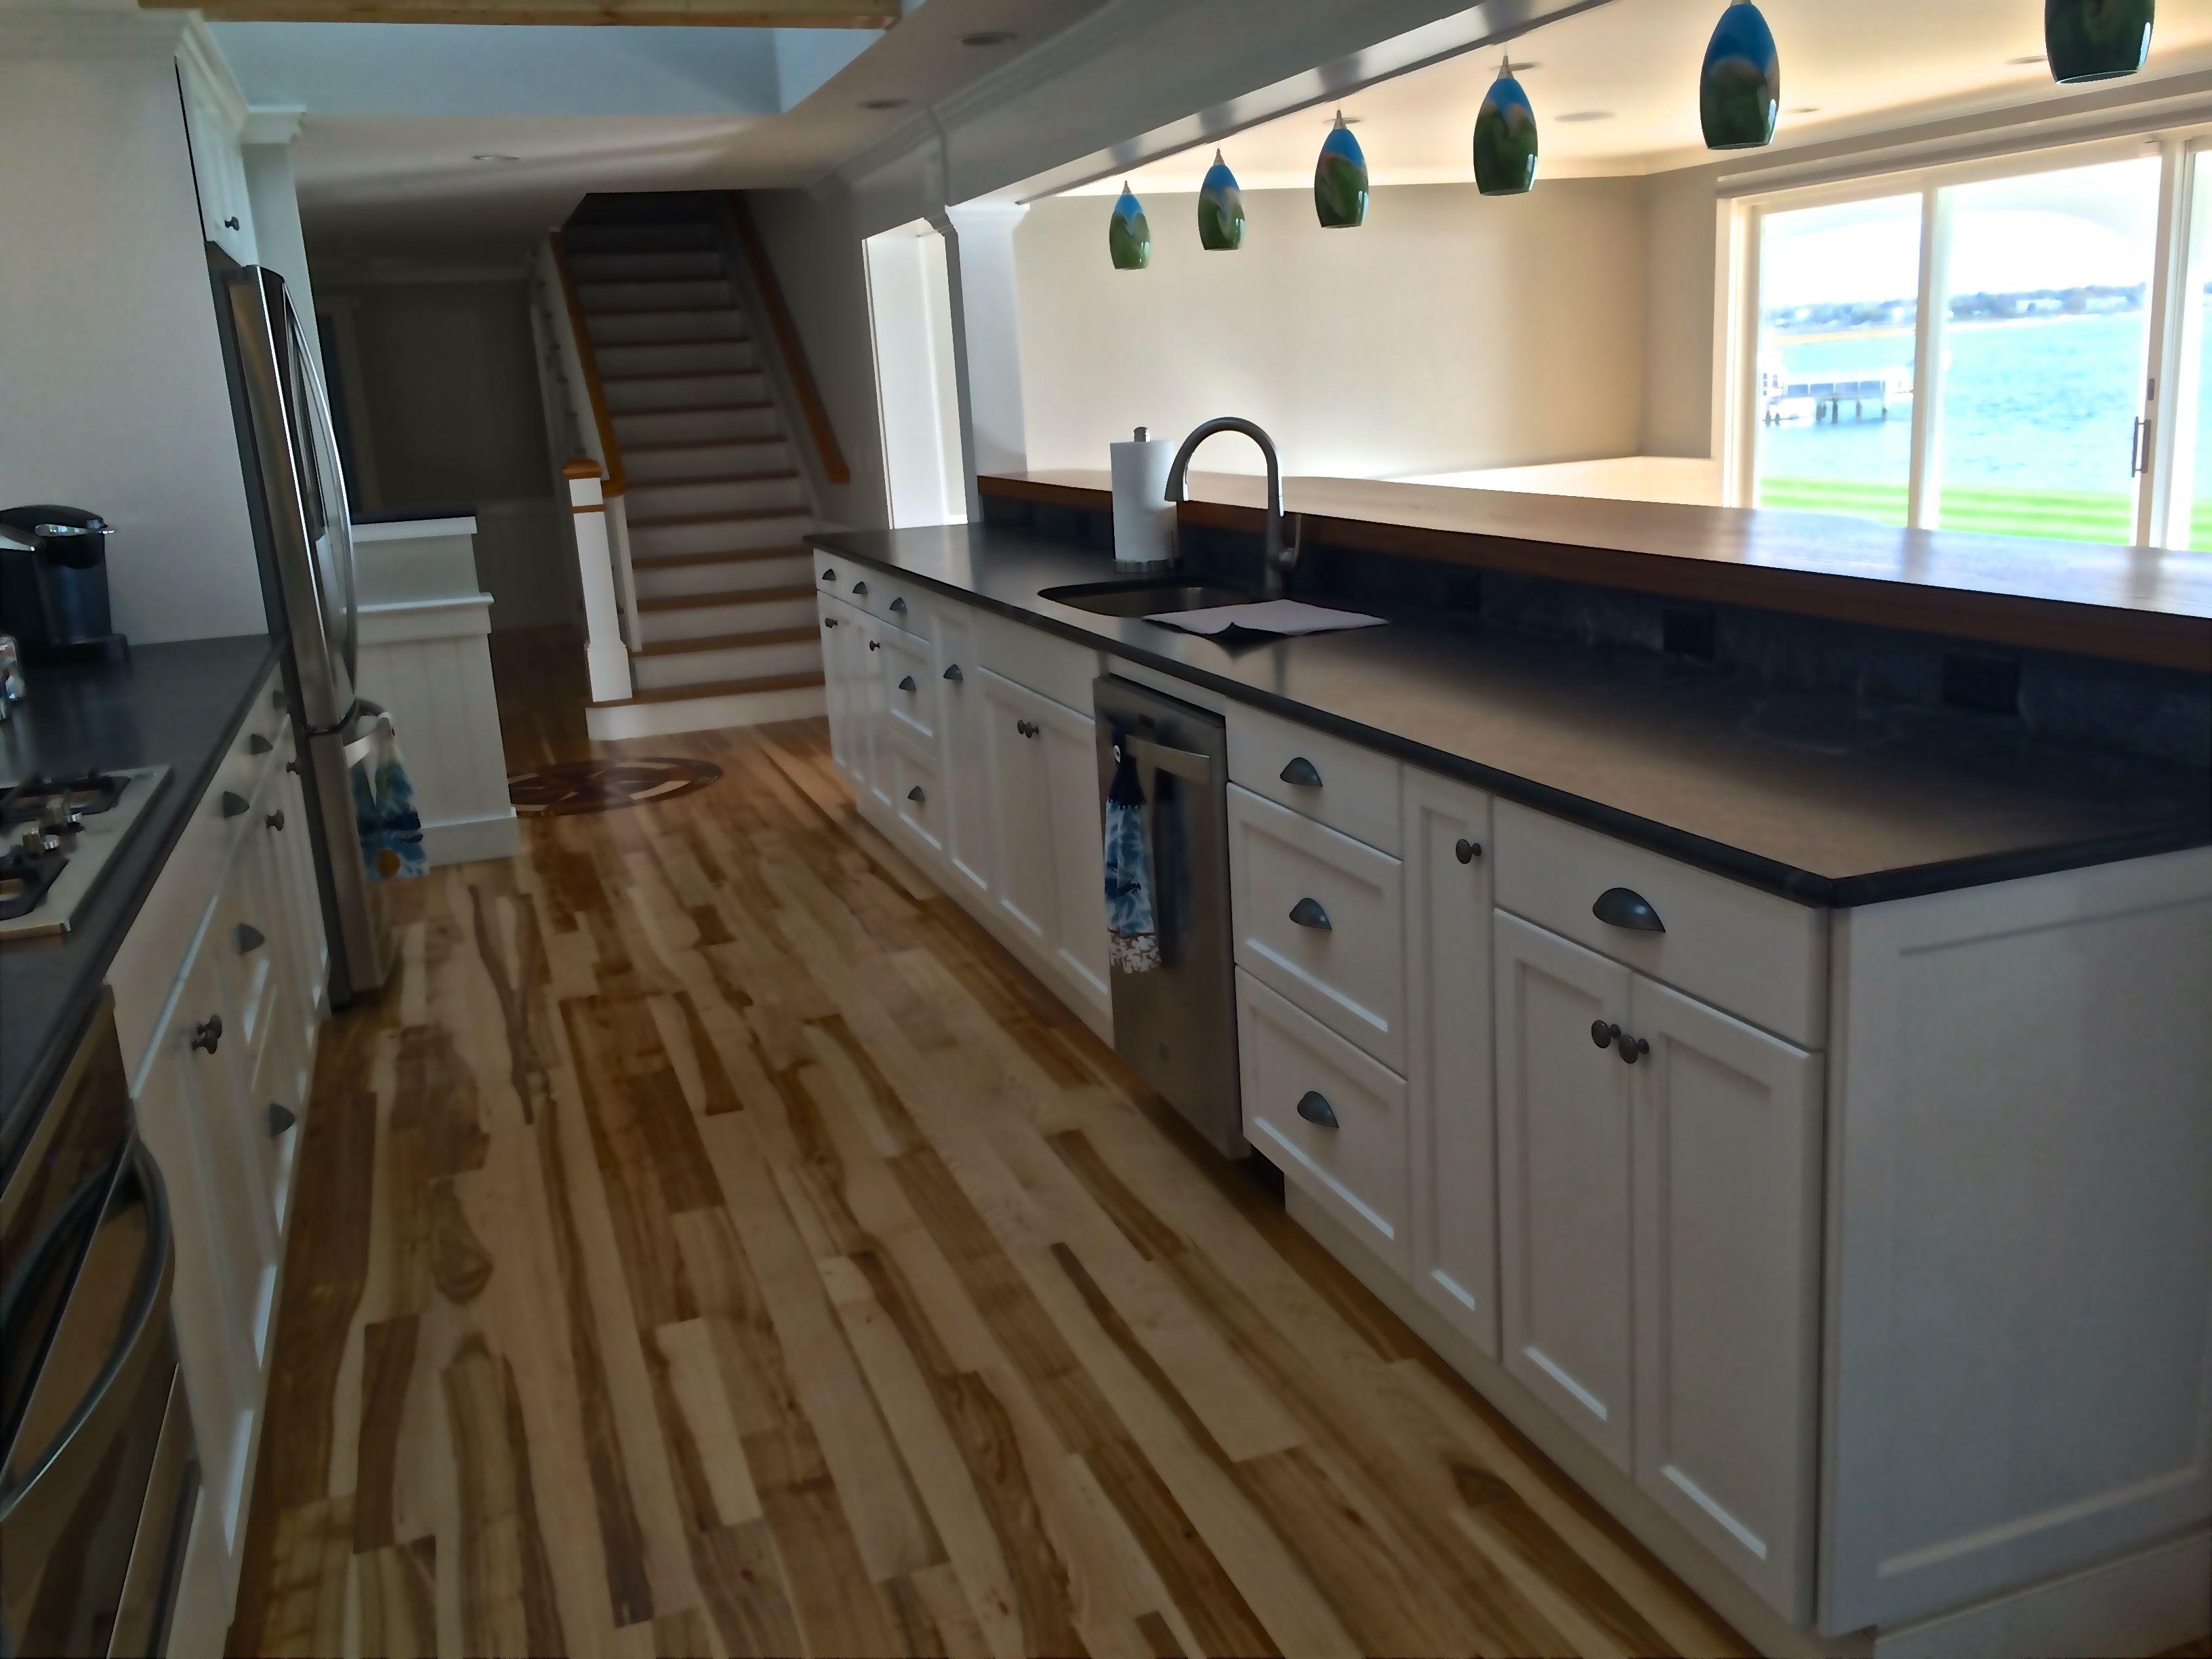 Beadboard Kitchen Cabinets For Sale Beadboard Kitchen Cabinets for Sale | Beadboard kitchen, Beadboard